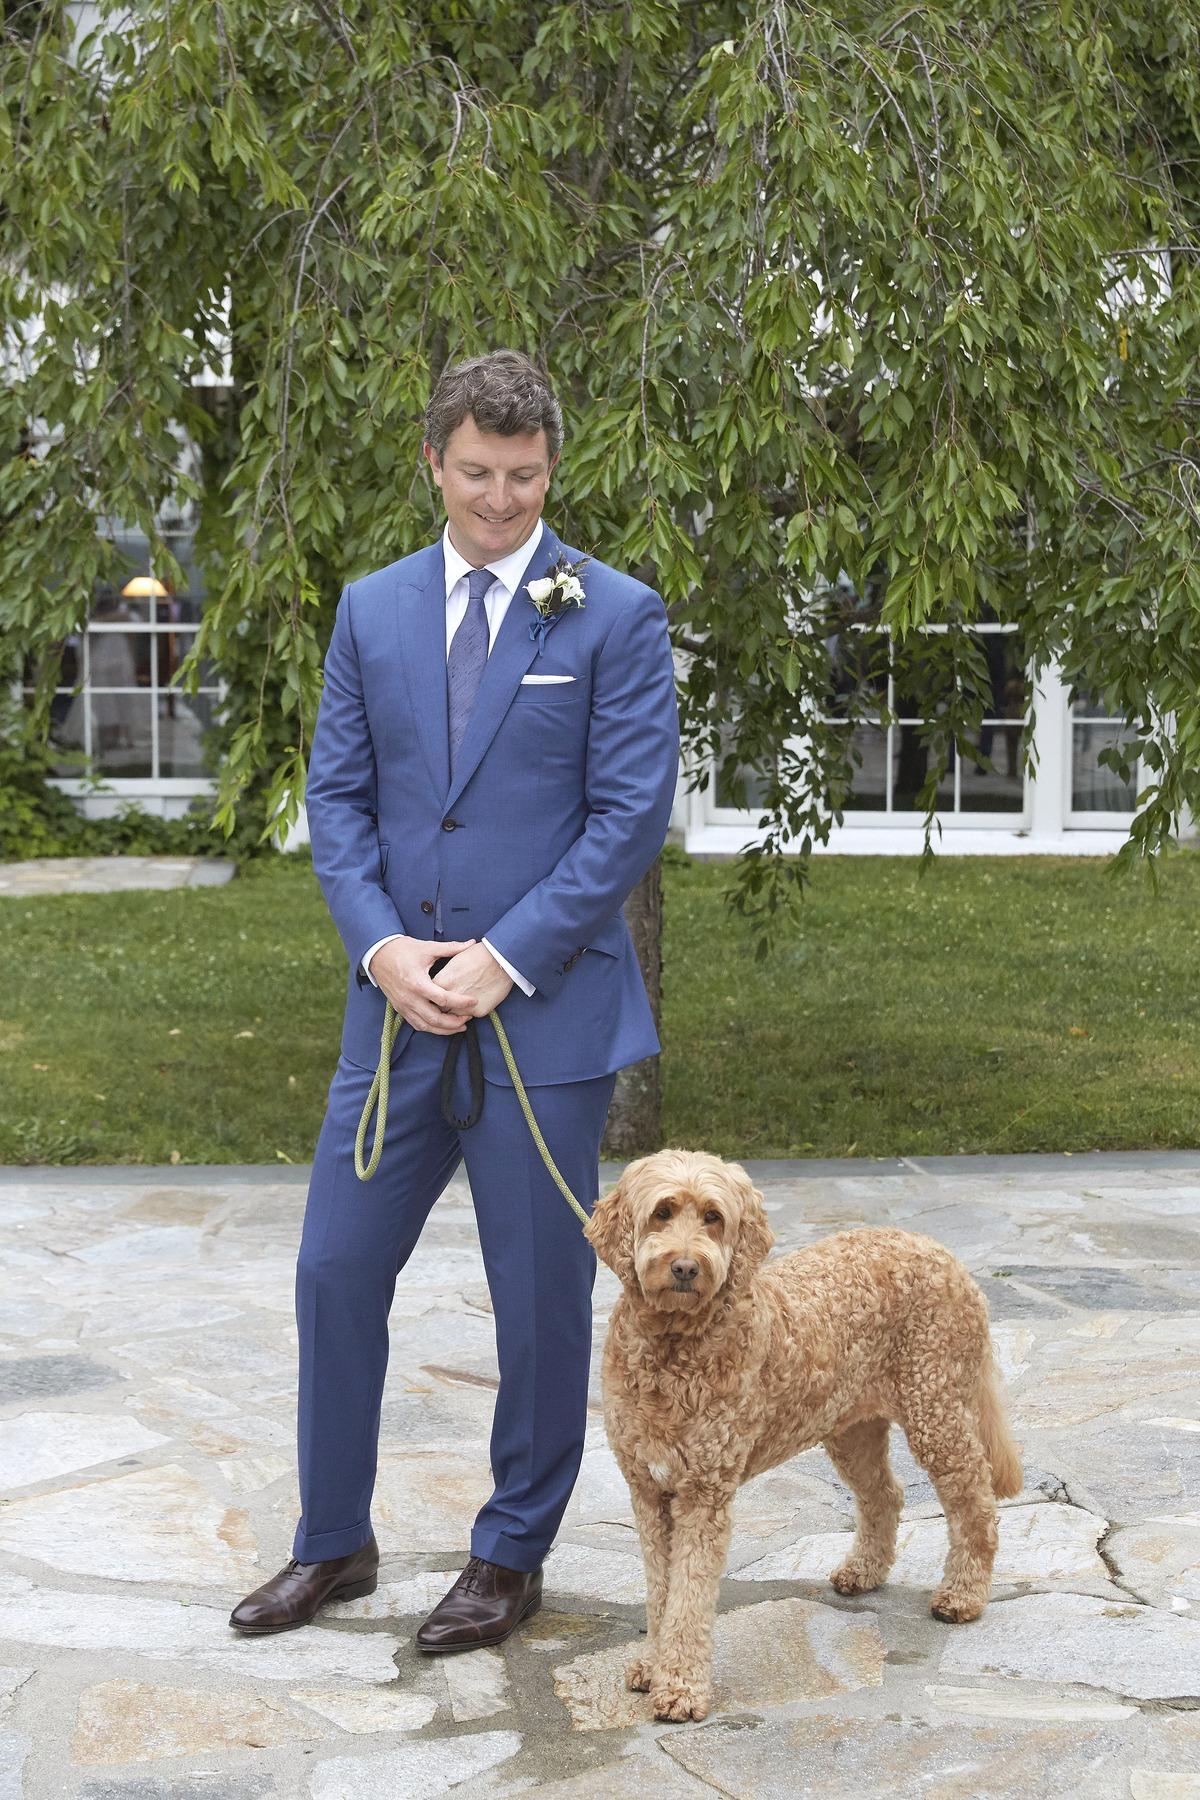 joyann jeremy wedding groom pet dog